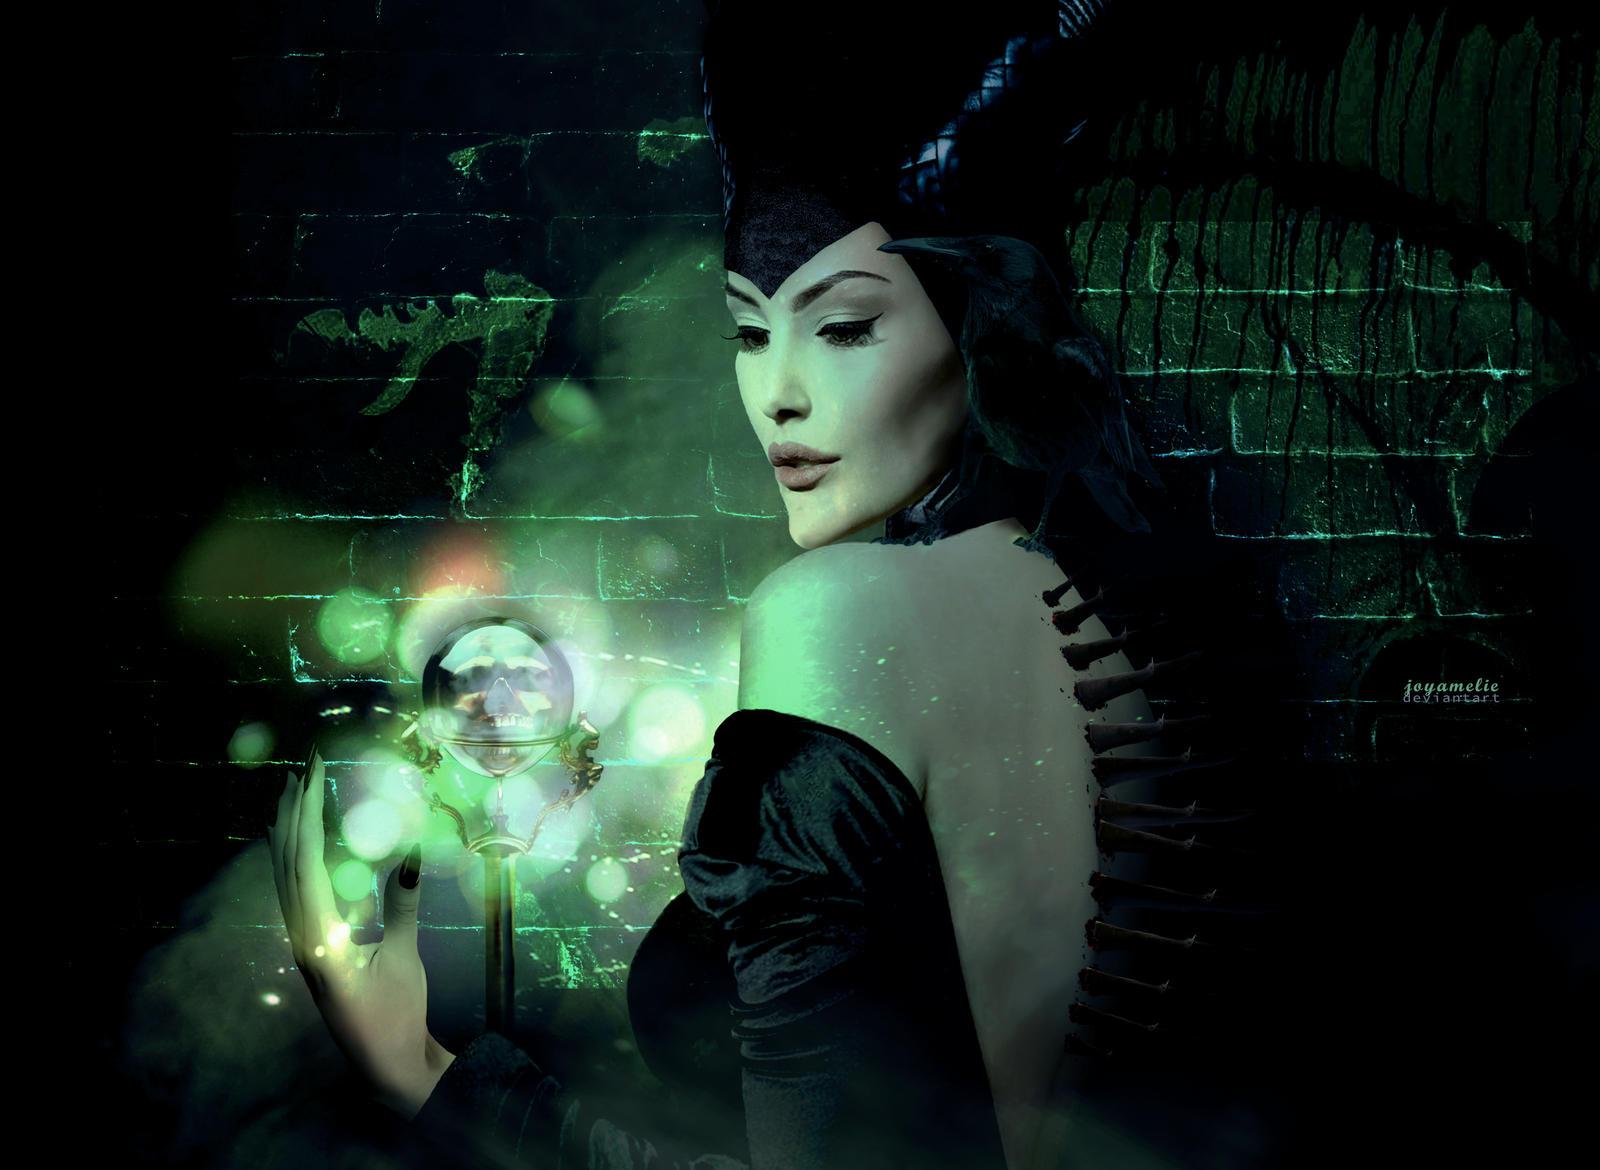 Maleficent by joyamelie on DeviantArt